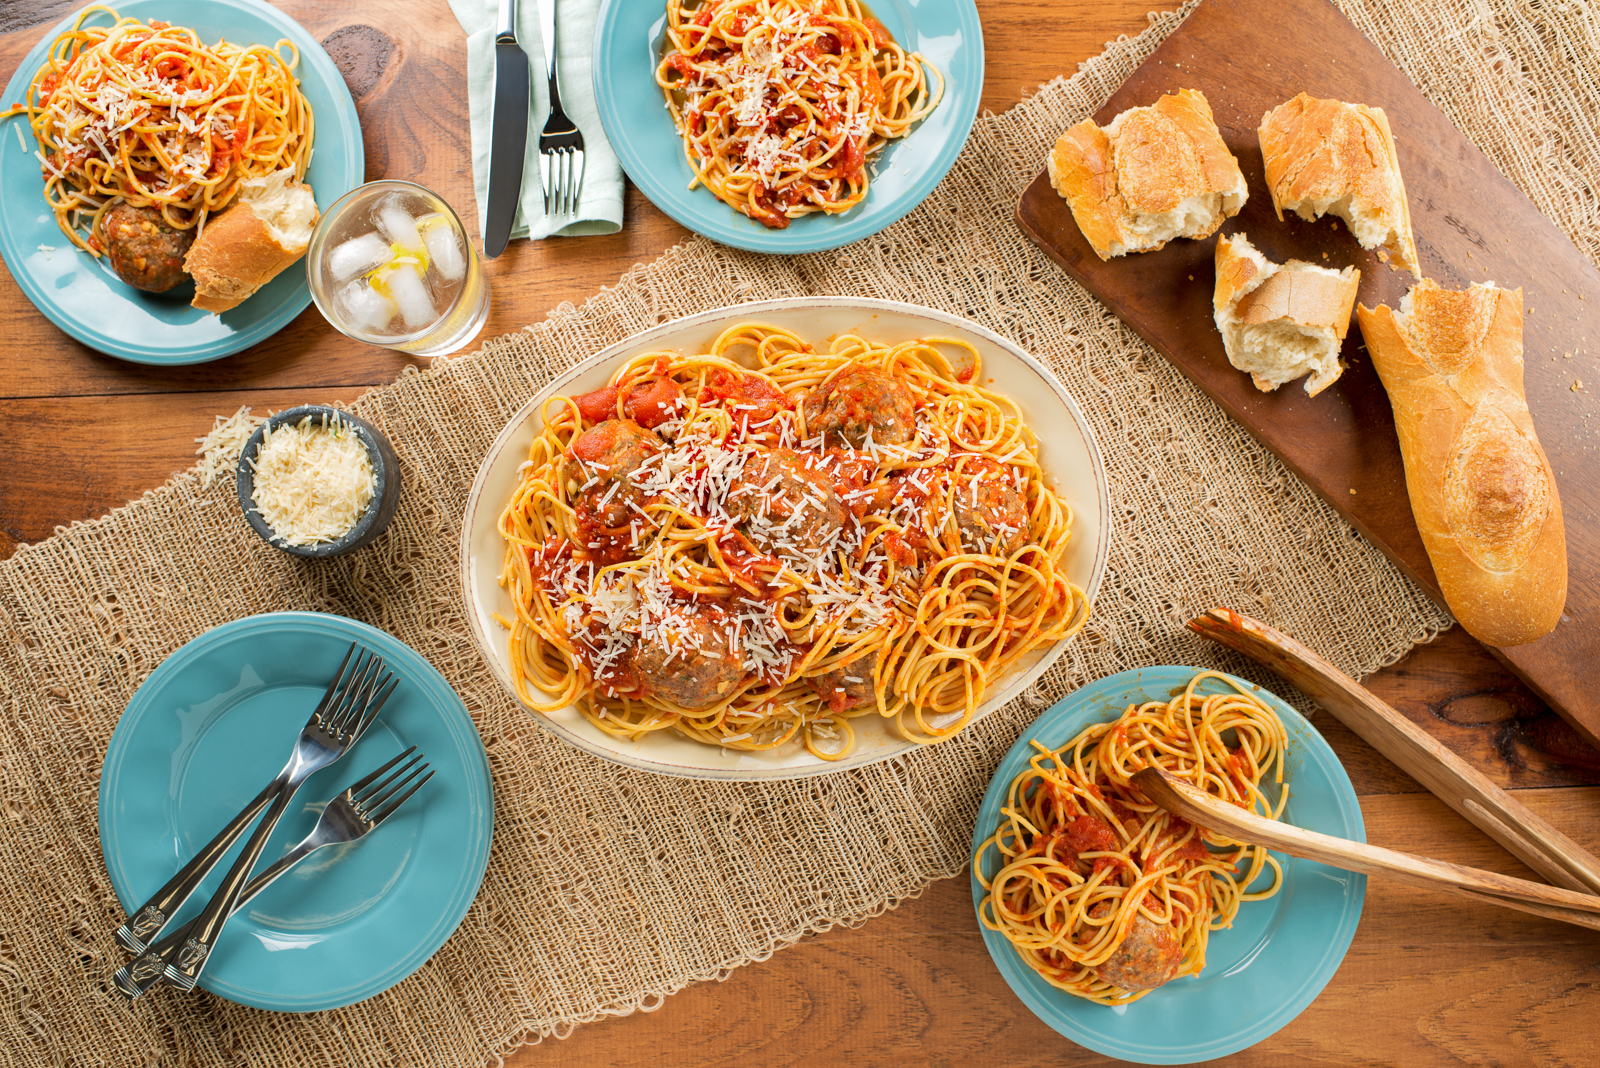 Sunday Spaghetti and Meatballs